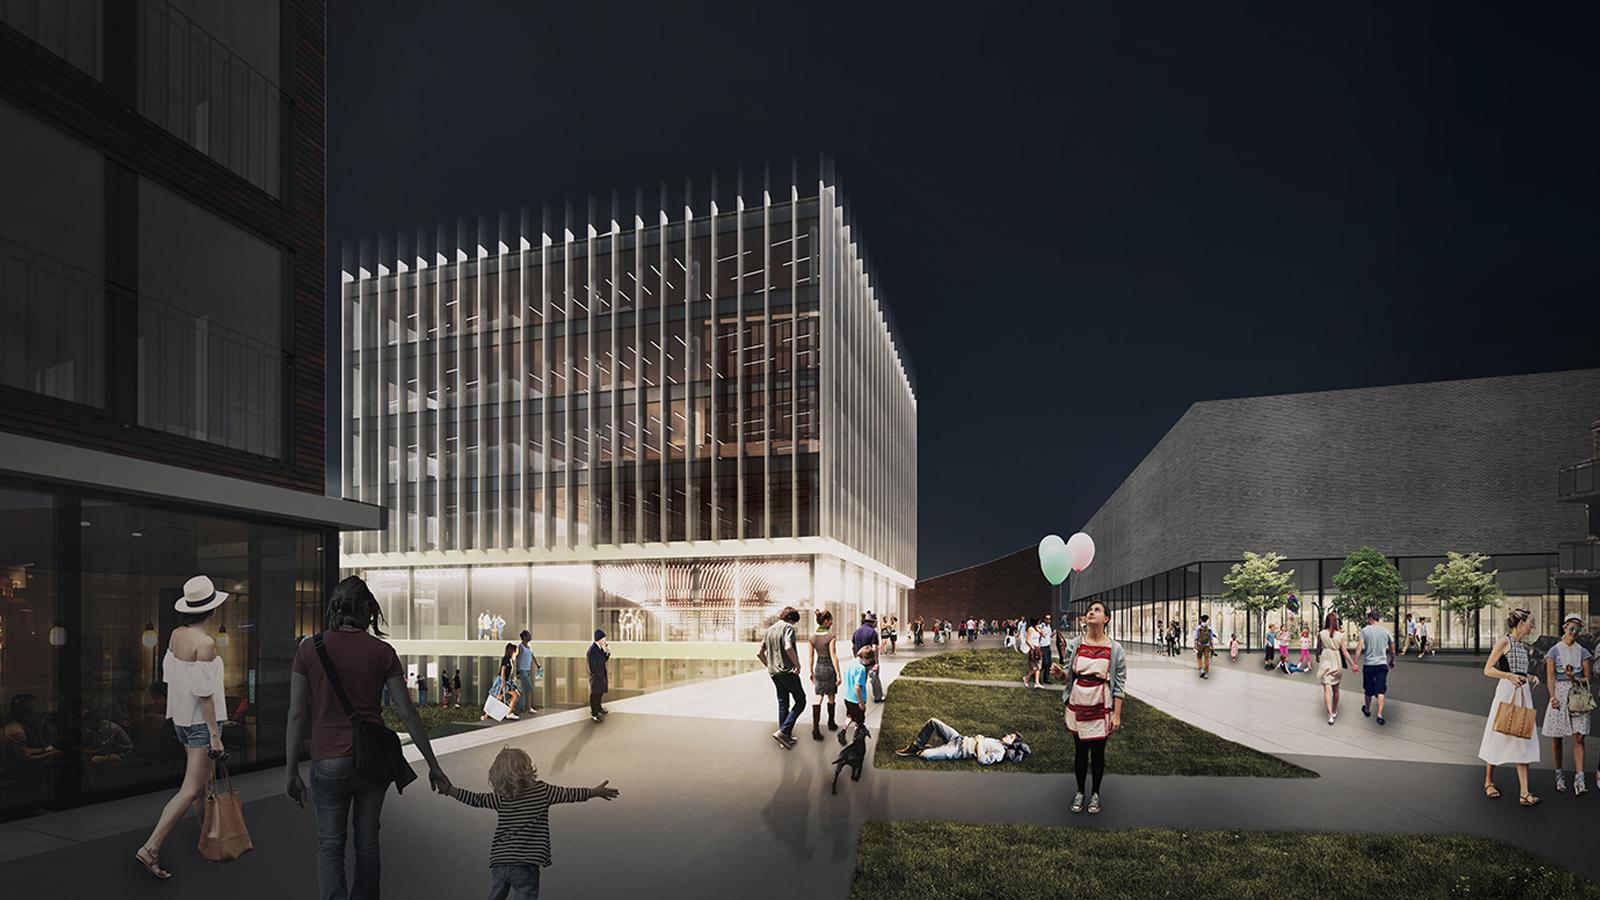 MJZ_Sola City hall (4)